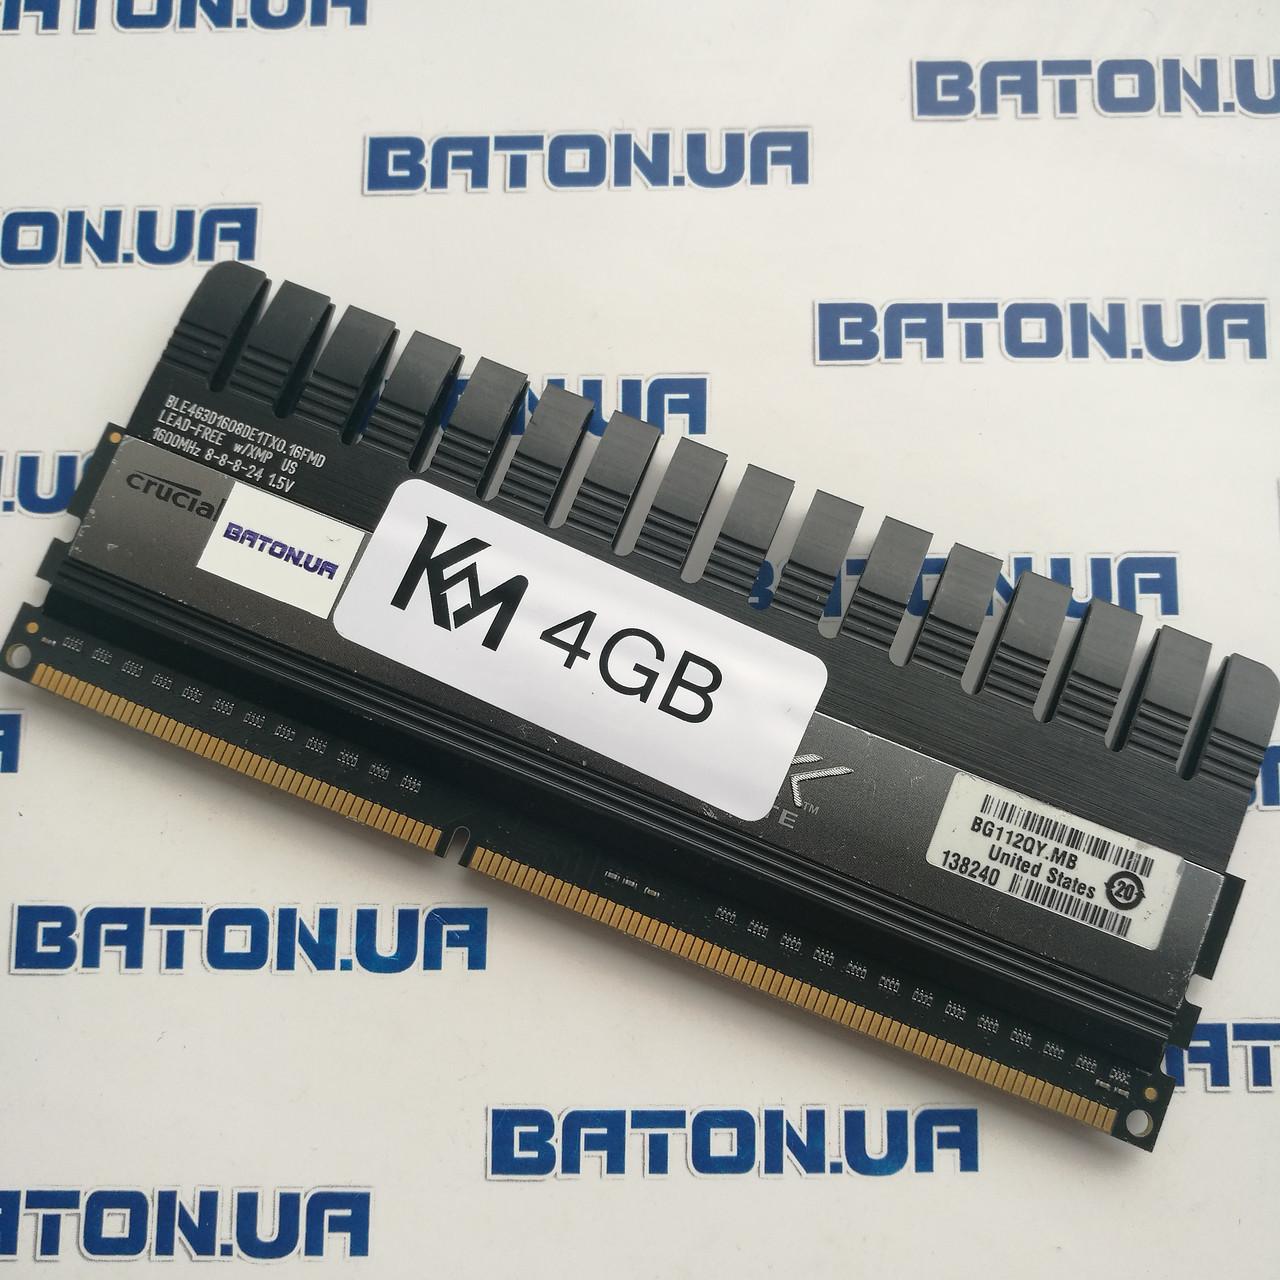 Игровая оперативная память Crucial Ballistix Elite DDR3 4Gb 1600MHz PC3 12800U CL8 (BLE4G3D1608DE1TX0.16FMD)